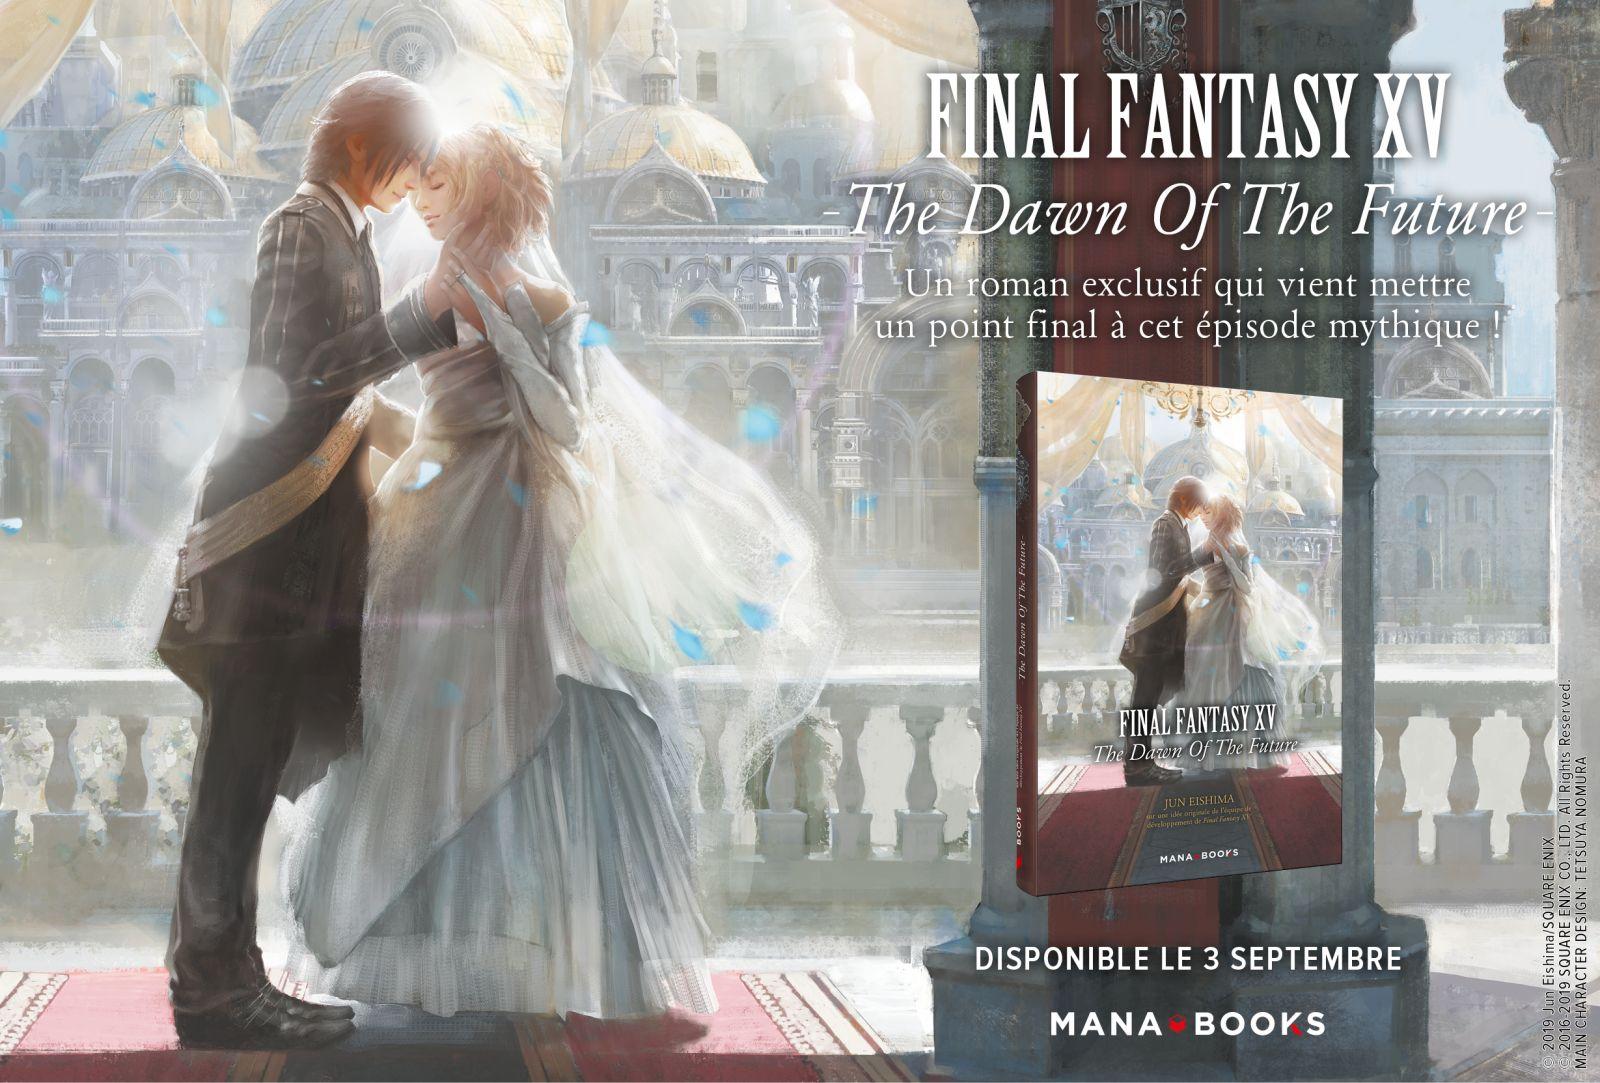 Final Fantasy [Jeu vidéo] - Page 41 FINALFANTASY_THEDAWNOFTHEFUTURE_FACEBOOK-Banniere